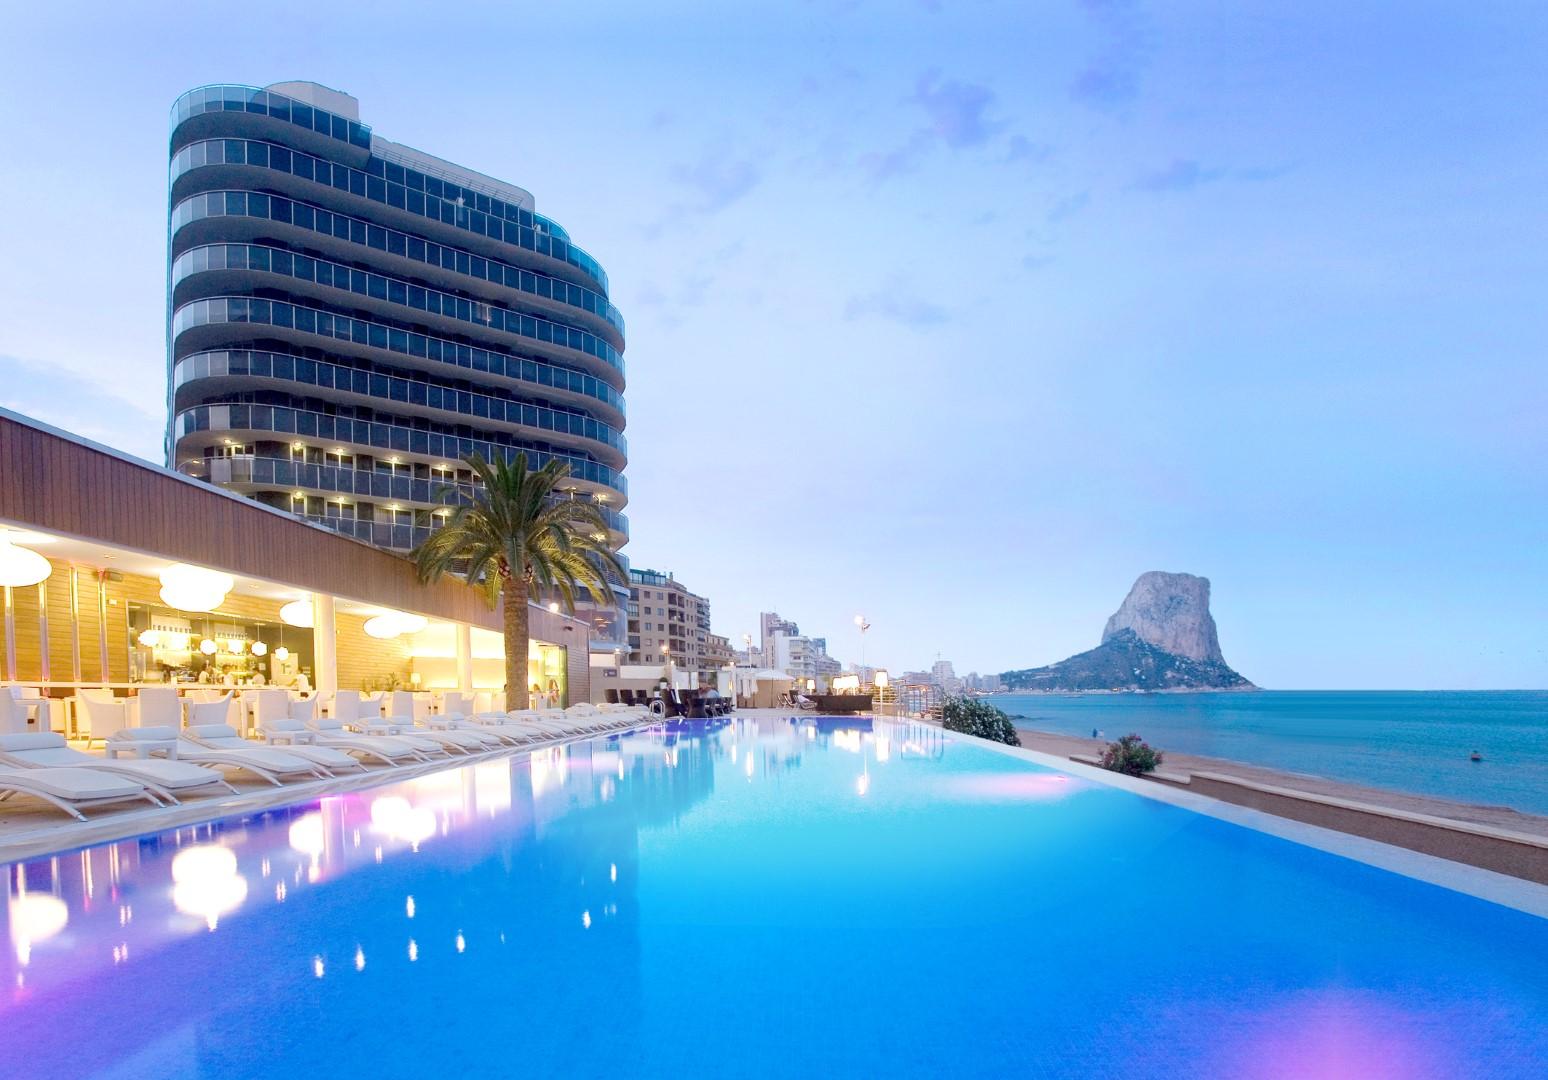 Los mejores hoteles con spa de espa a for Hoteles con piscina